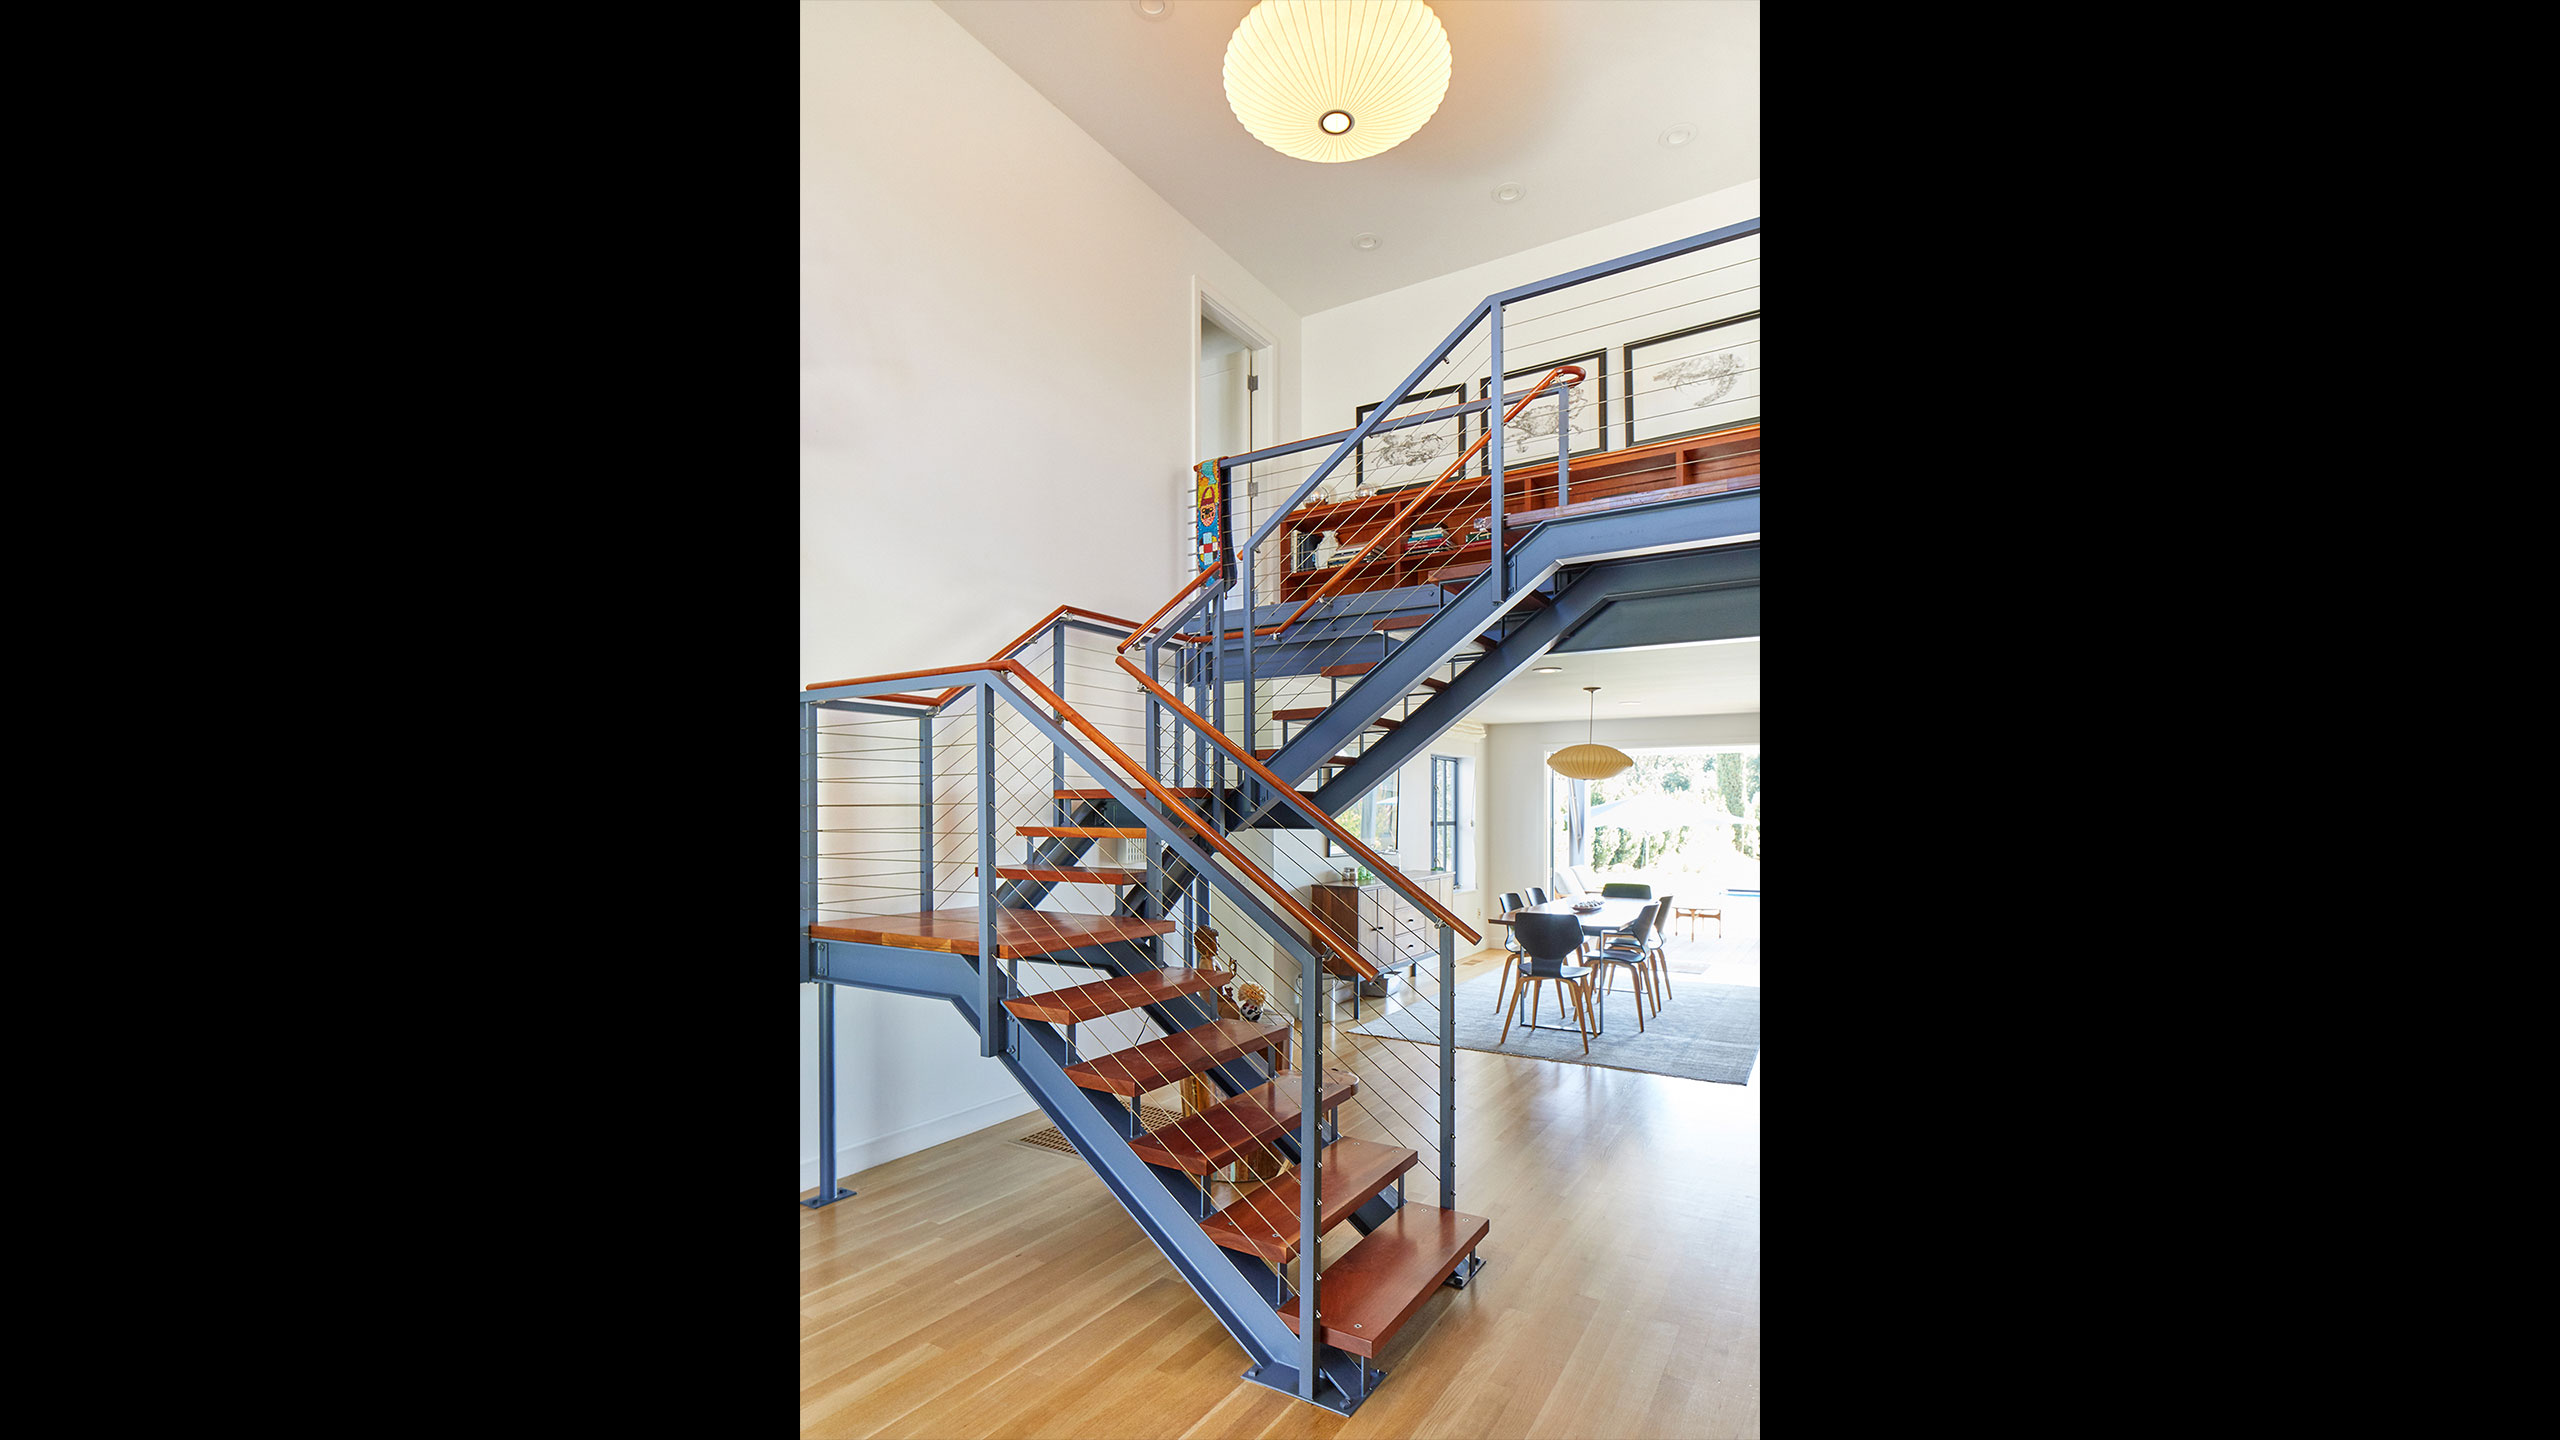 Napa-Farmhouse-open-staircase-metal-and-wood